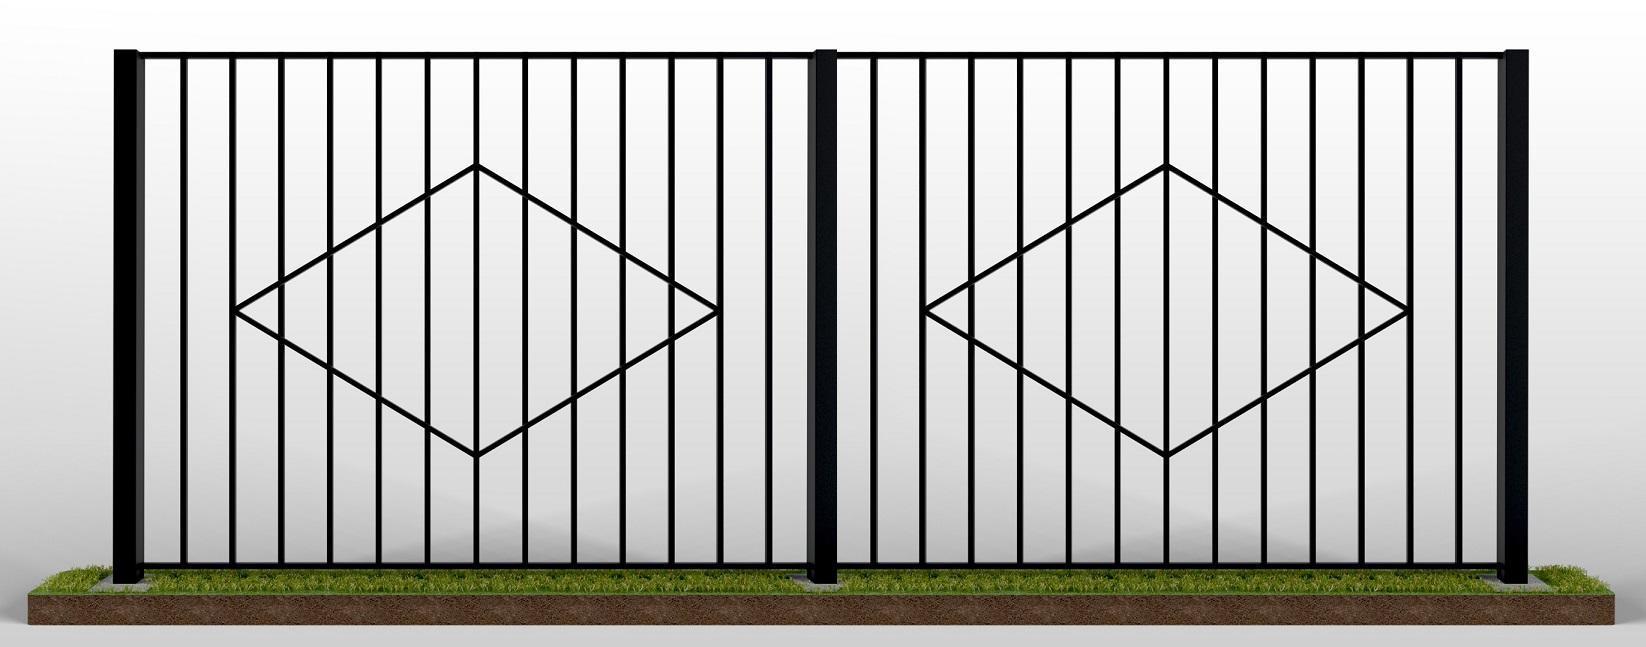 Забор из профтрубы 15х15 картинки, открытки цитатами